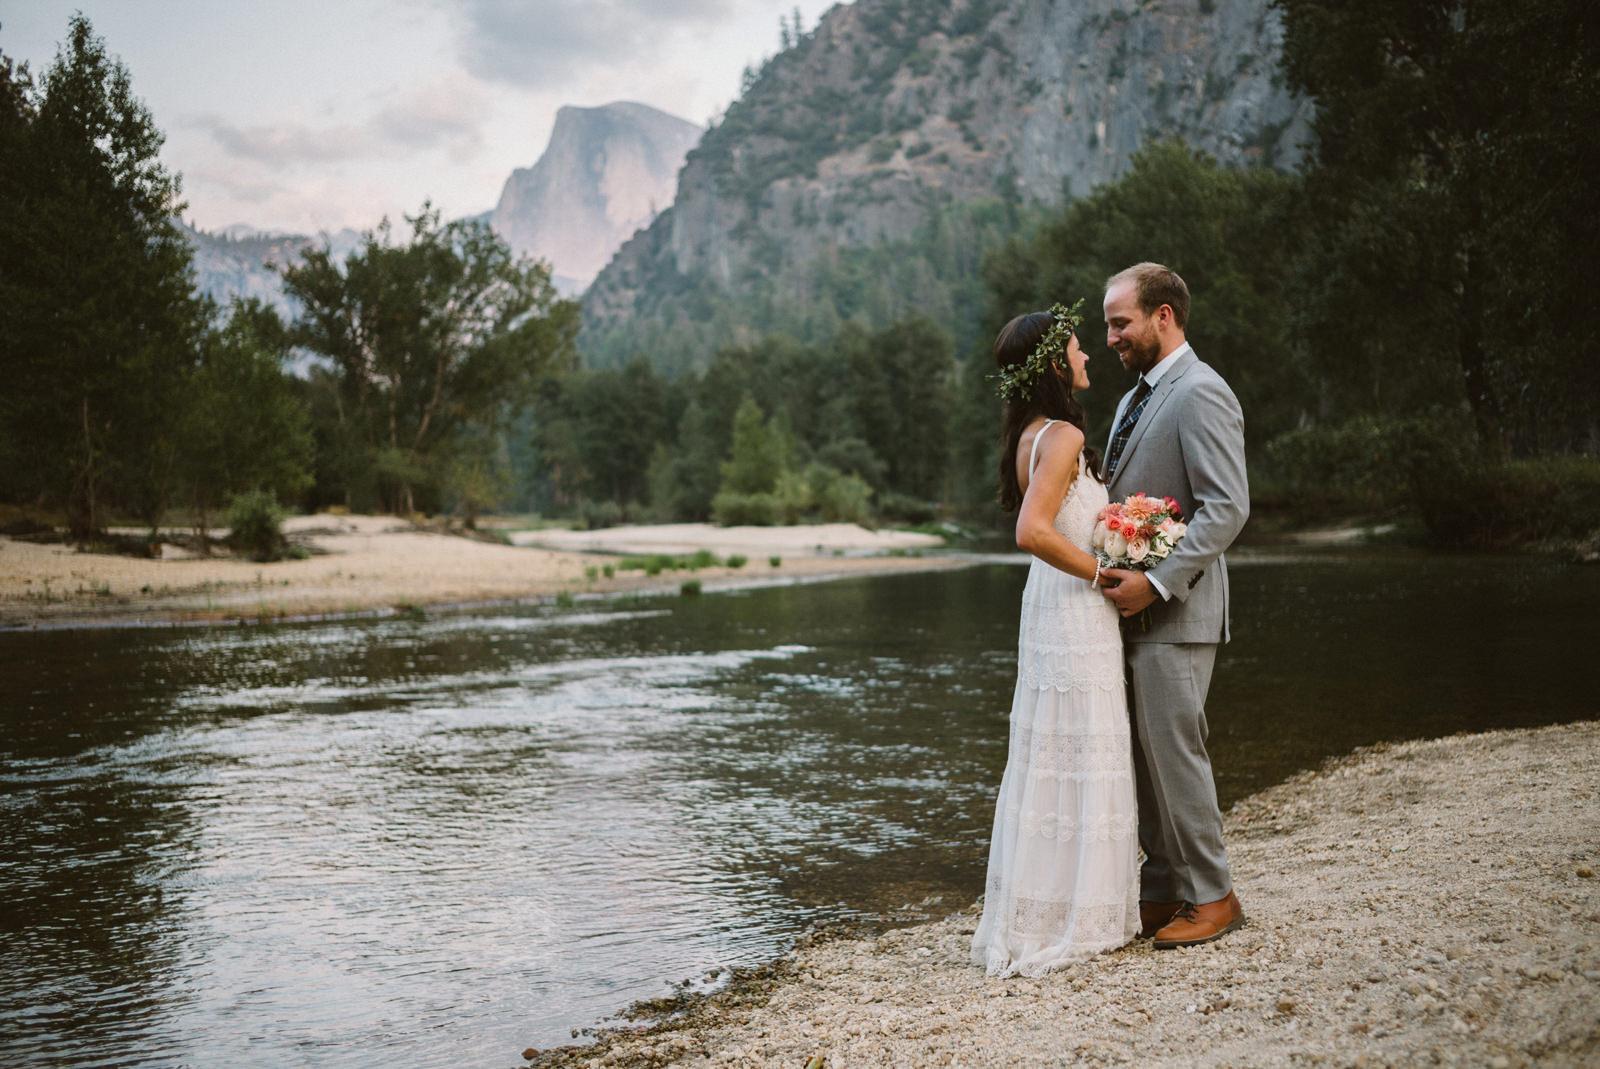 yosemite-intimate-wedding-088 YOSEMITE INTIMATE WEDDING